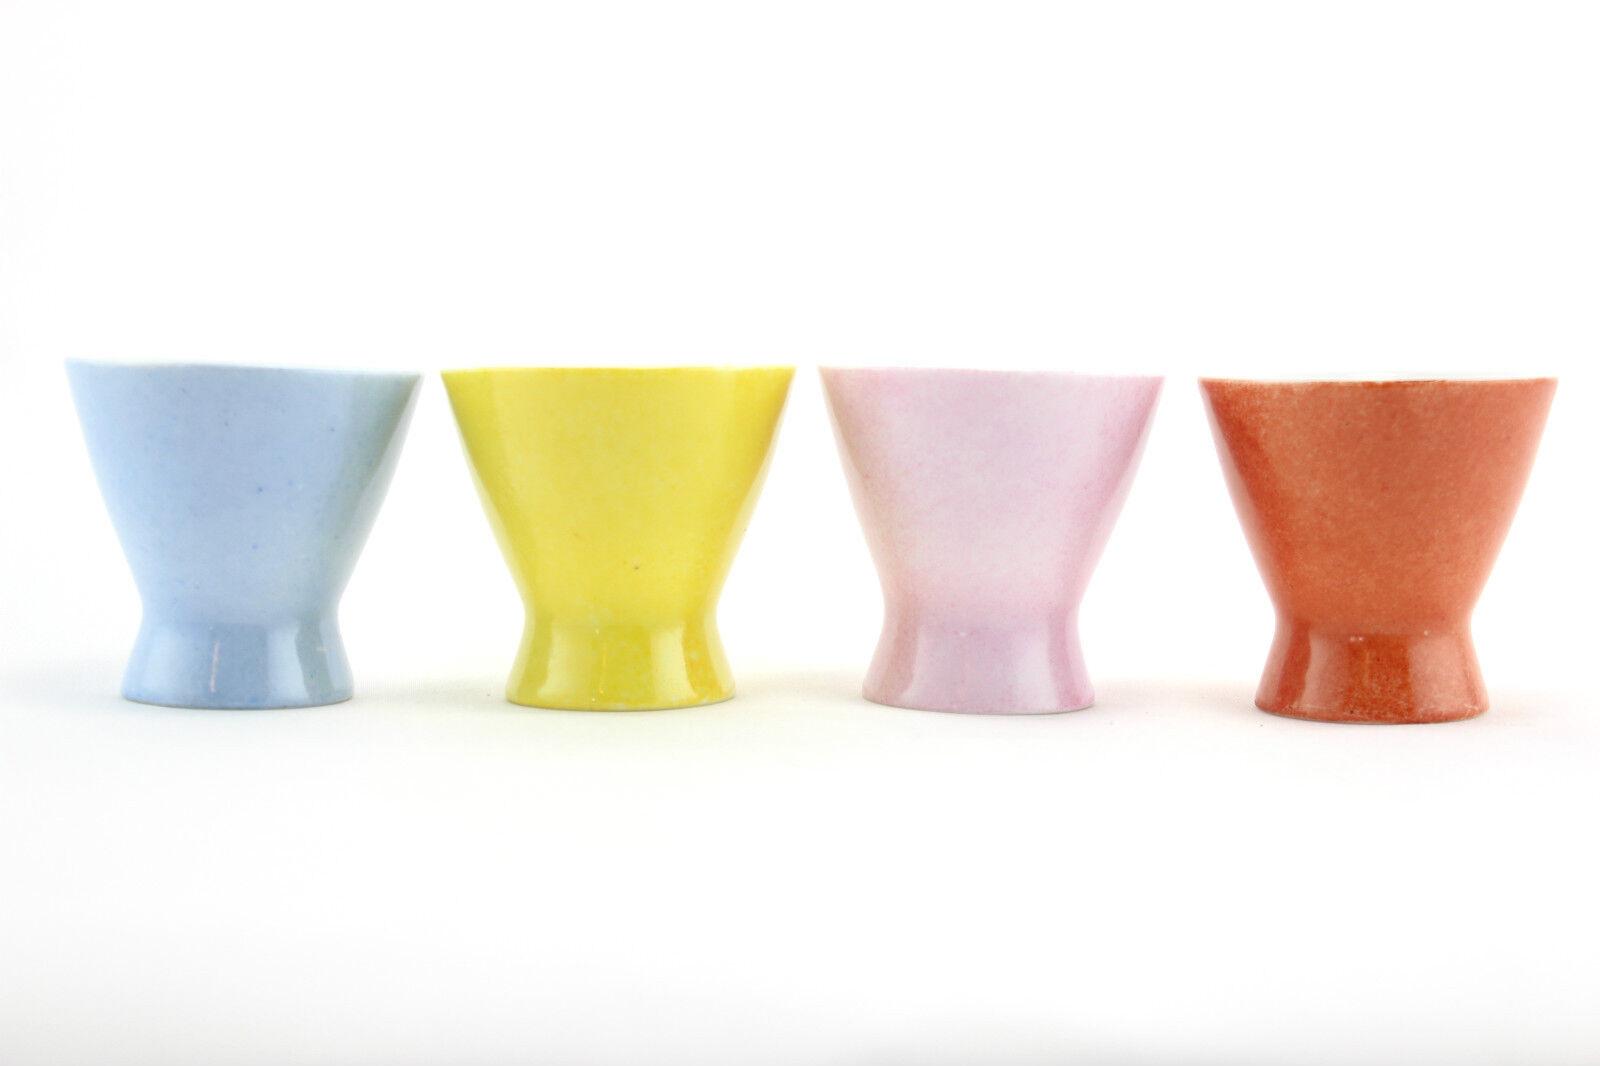 4 x multi-coloured pinknthal 'Form 2000' egg cups. German design. Modernist